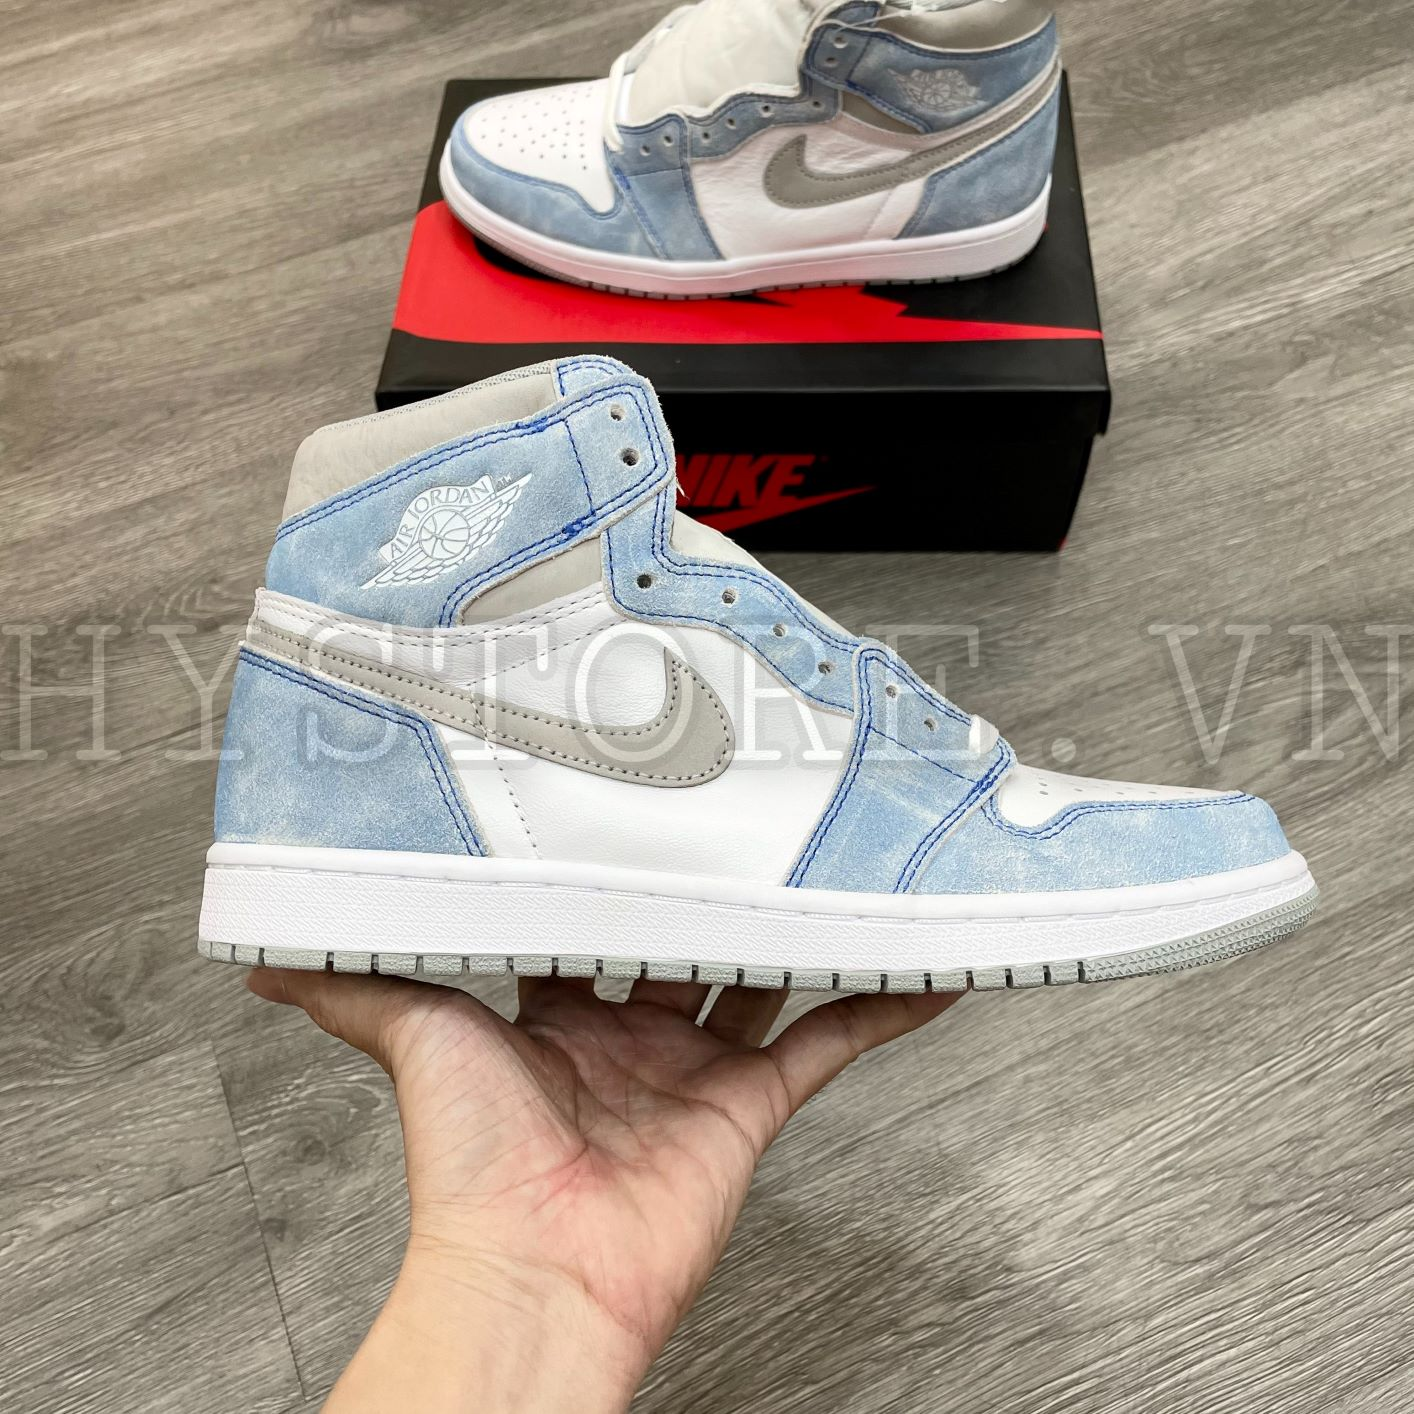 Giày Nike Air Jordan1 Hyper Royal